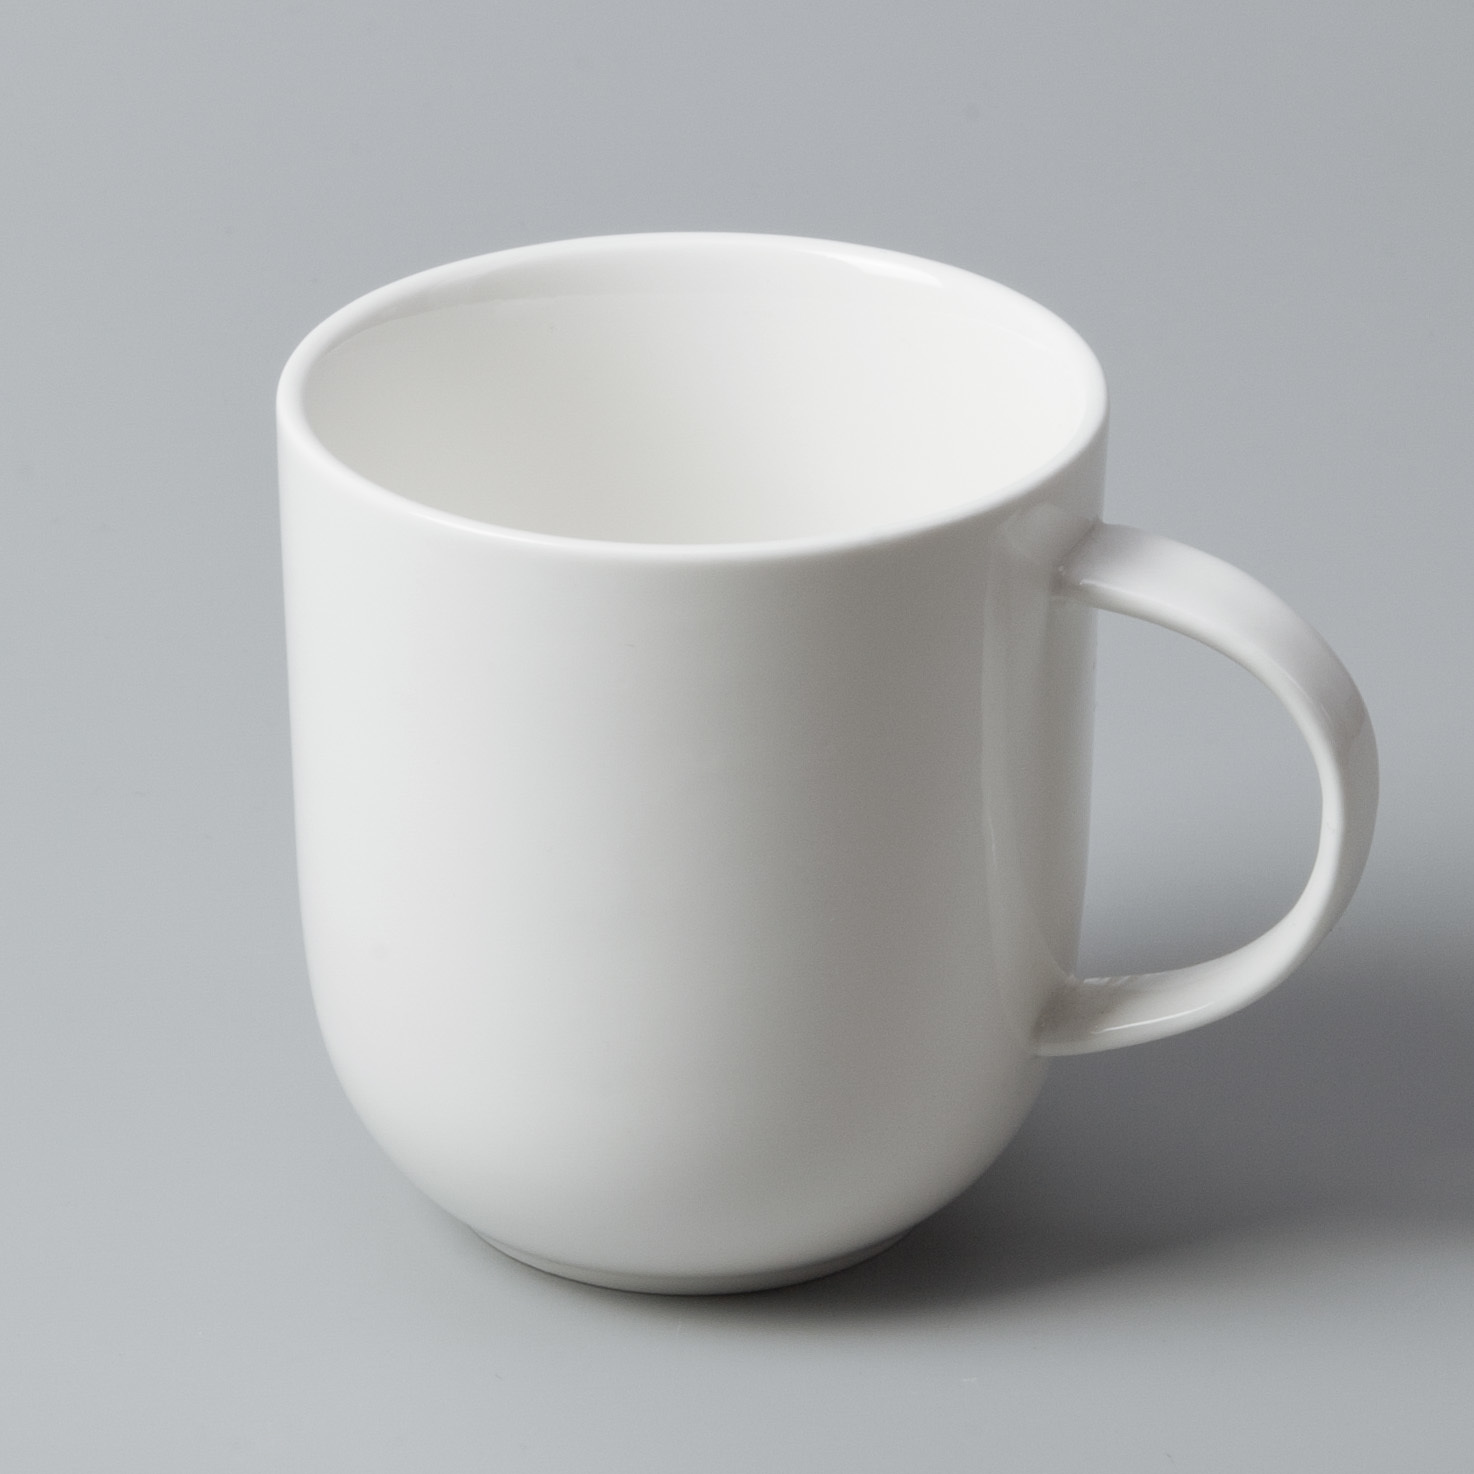 casual white porcelain dish set series for restaurant